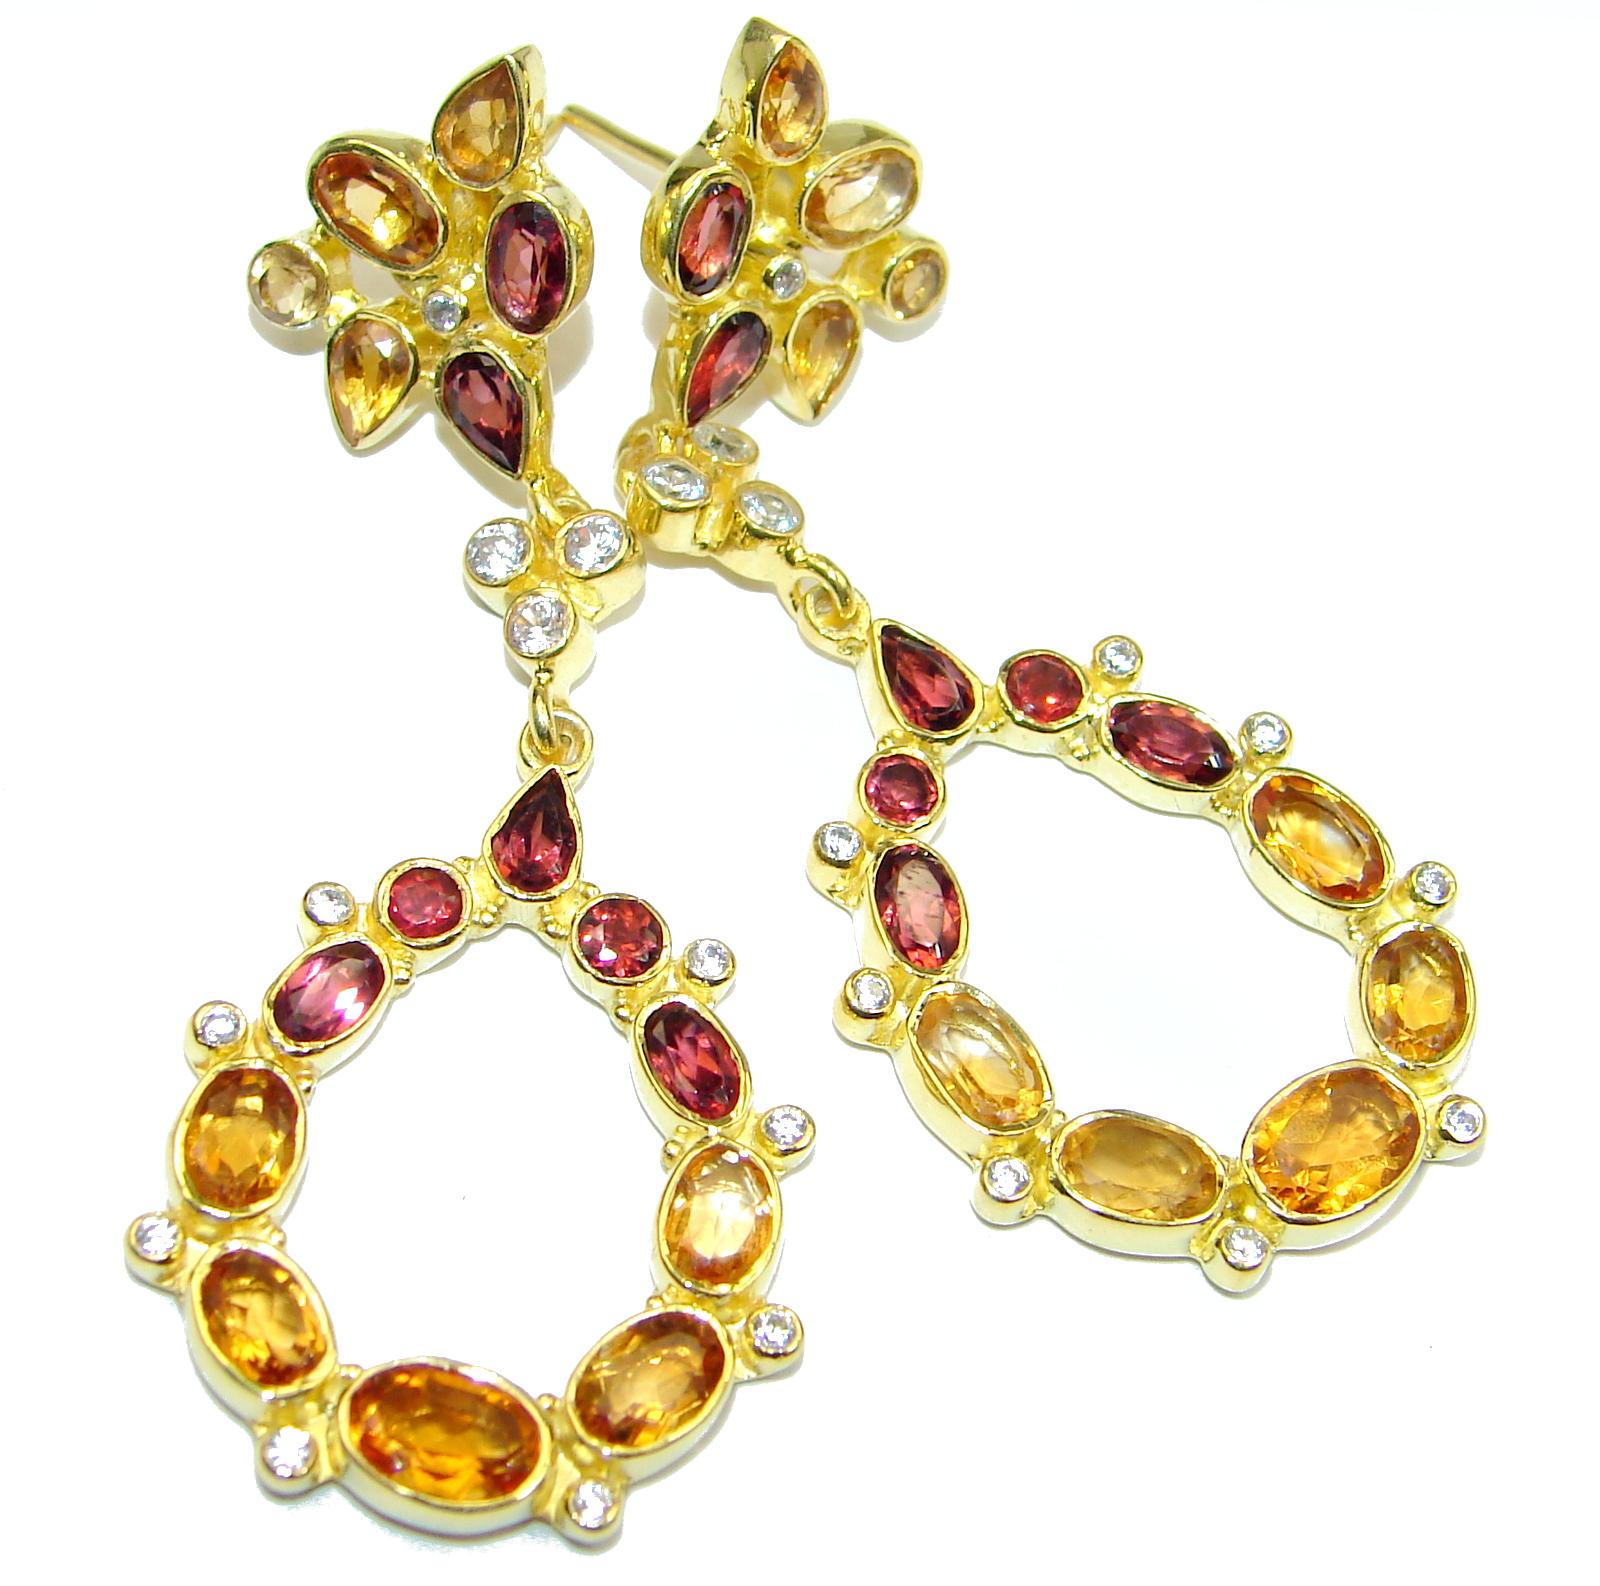 Secret Beauty Orange Sapphire 14K Gold over .925 Sterling Silver handcrafted earrings